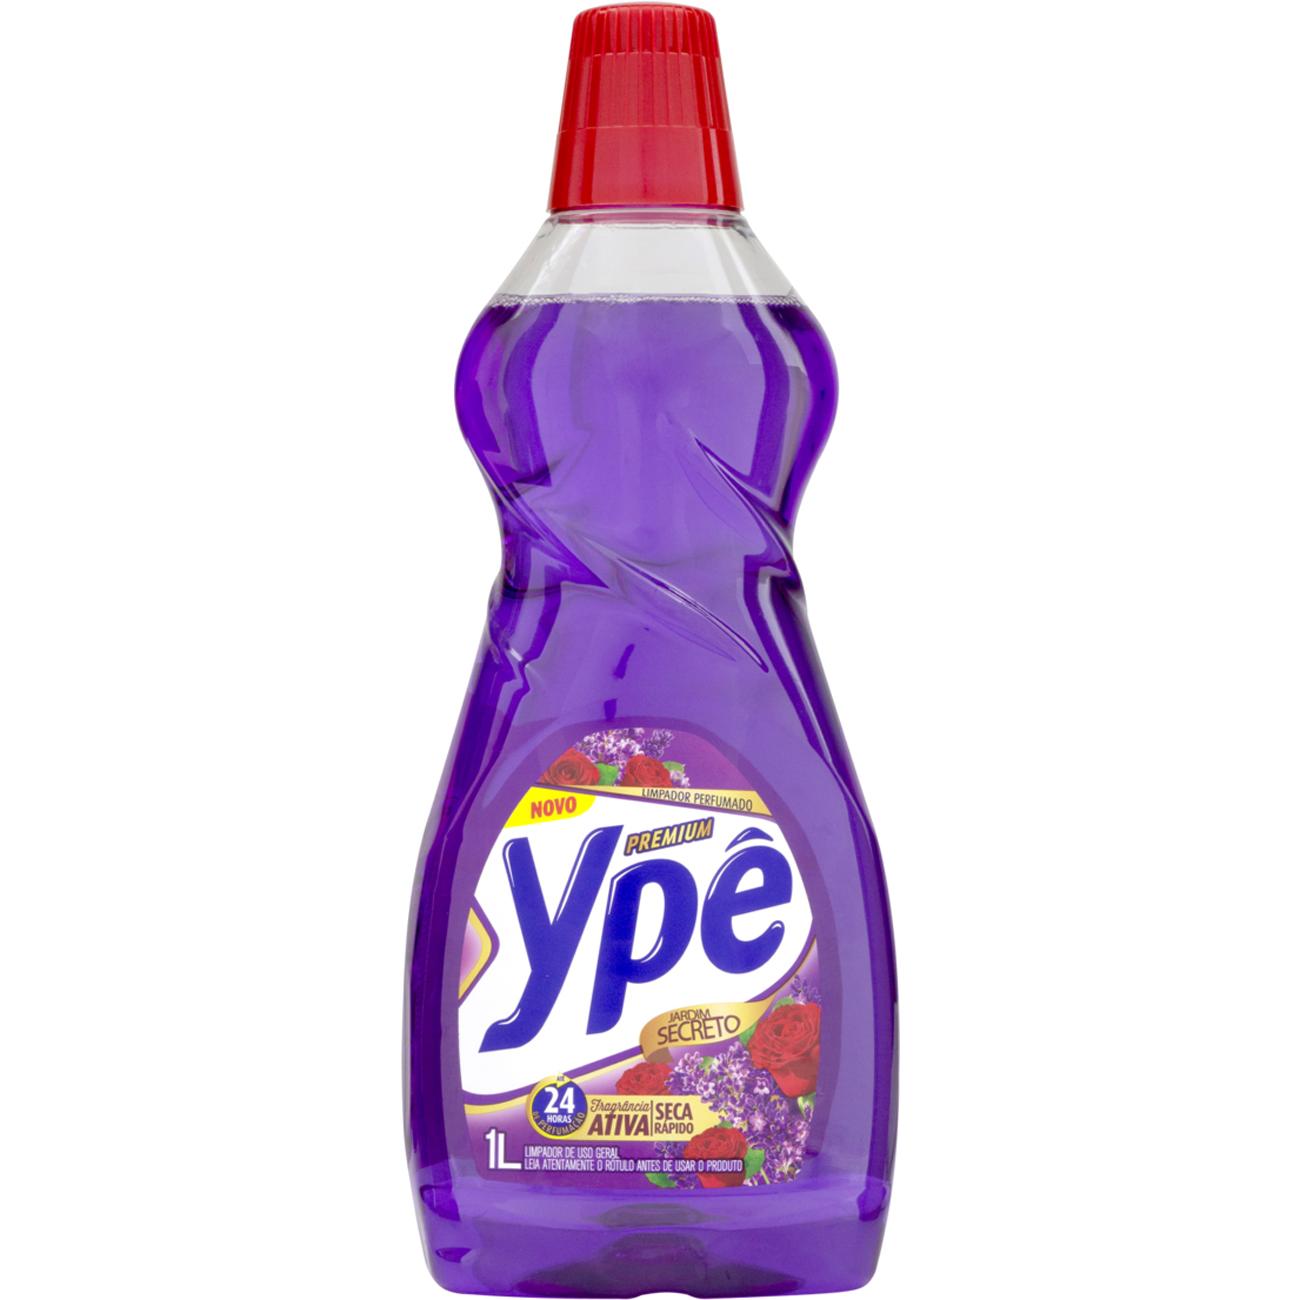 Limpador Perfumado Ype 500Ml Jd Secreto